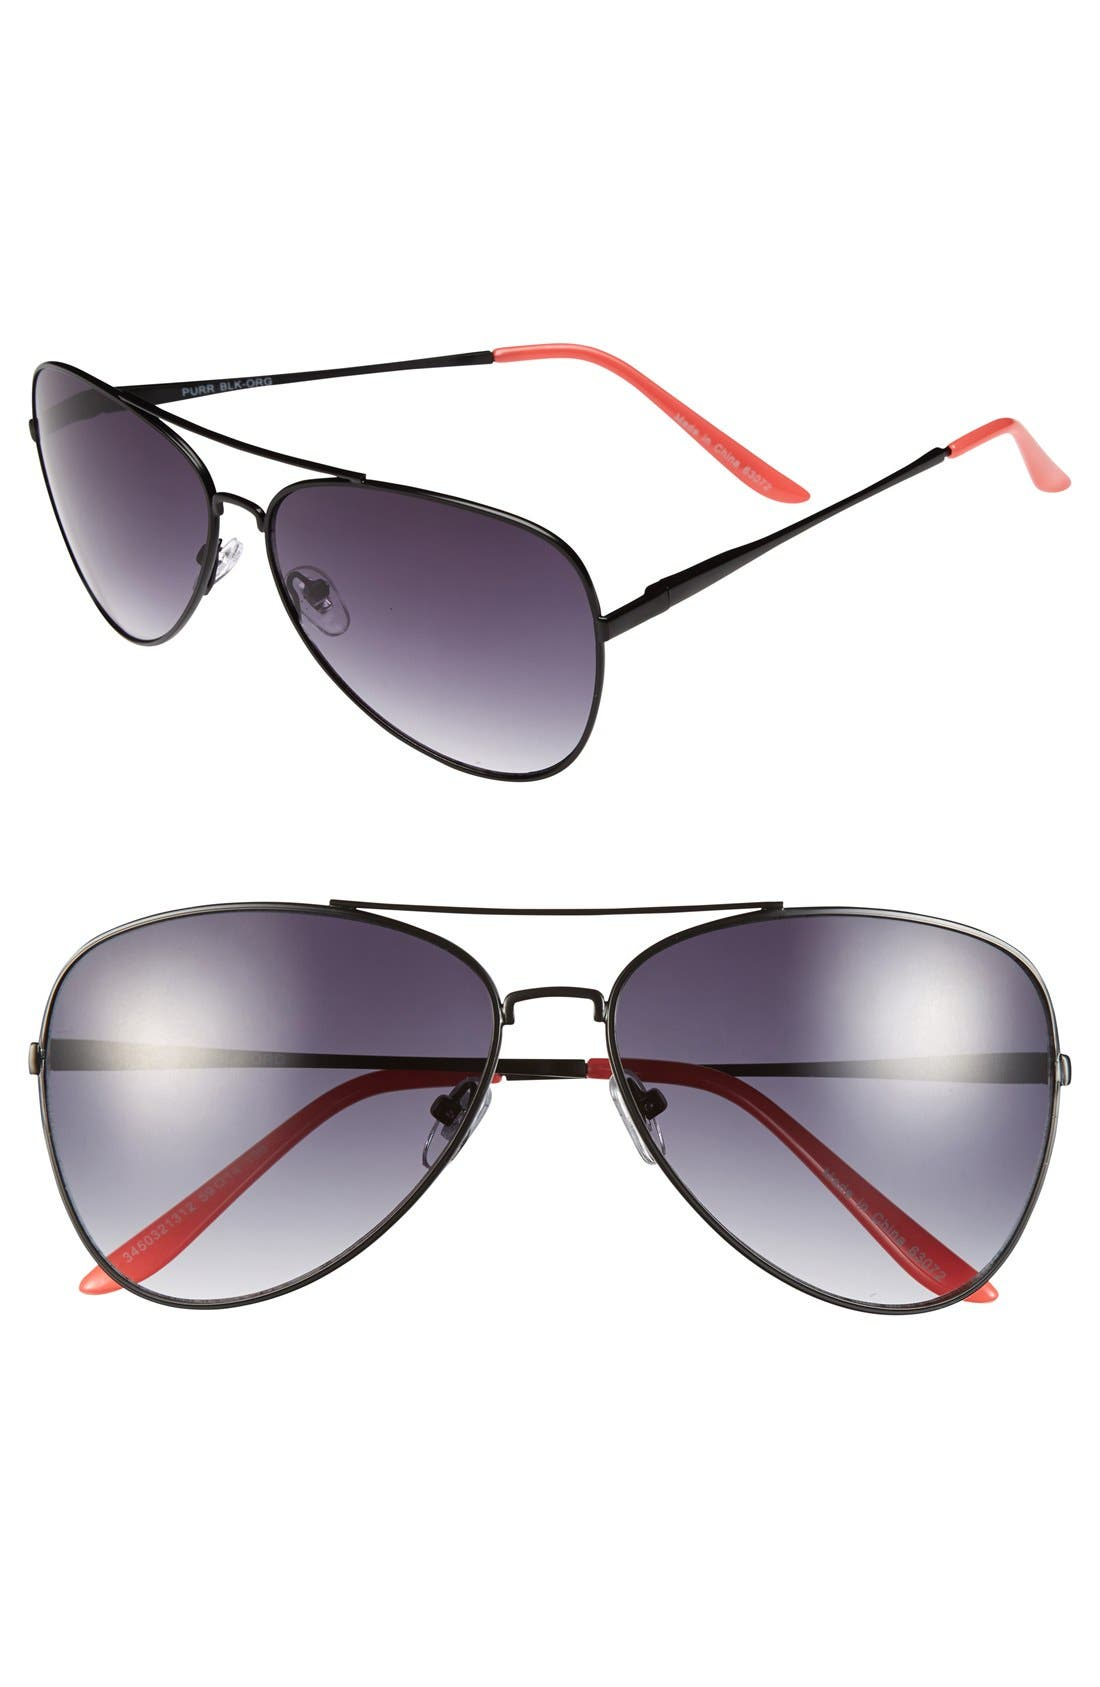 Alternate Image 1 Selected - Outlook Eyewear 'Purr' 59mm Aviator Sunglasses